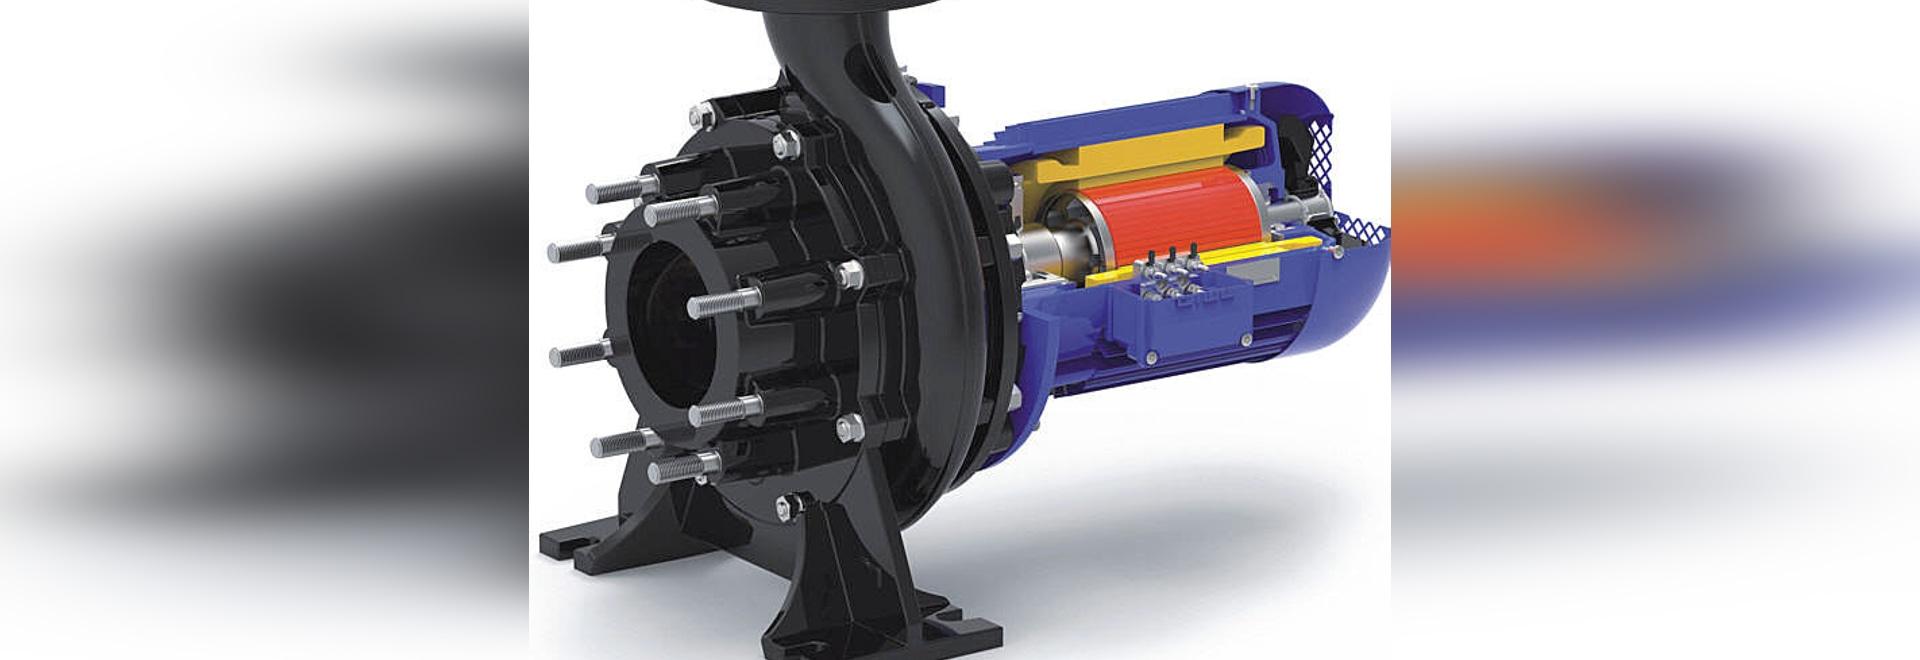 Products of Herborner Pumps - herborner.F-PM